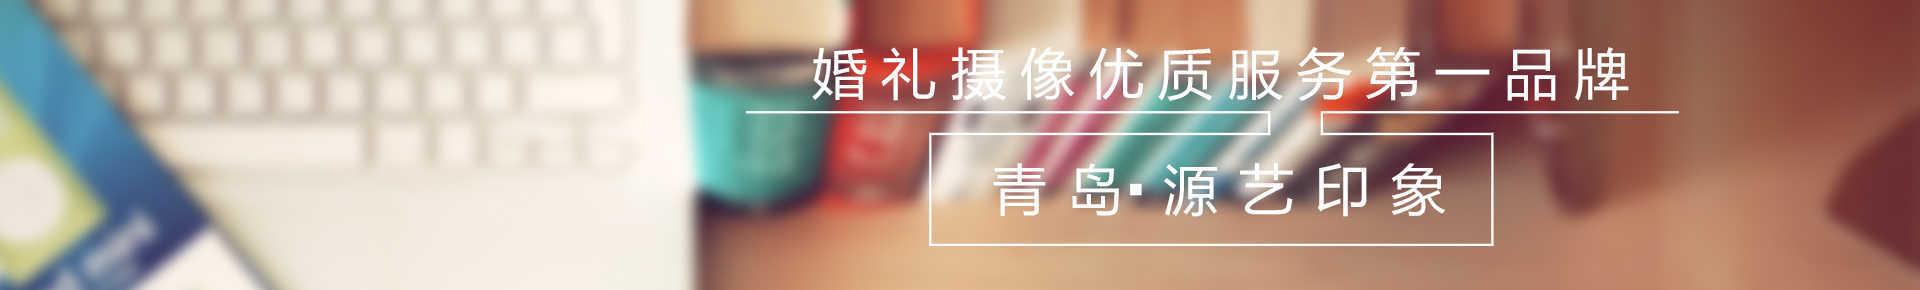 源艺印象影视工作室 banner